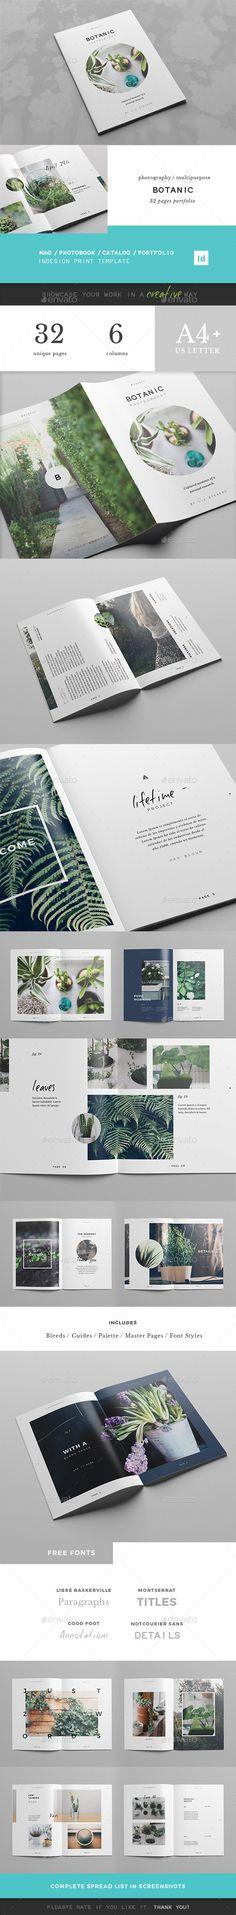 Botanic / Multipurpose Creative Portfolio Brochure Template. Download: http://graphicriver.net/item/botanic-multipurpose-creative-portfolio/11370049?ref=ksioks